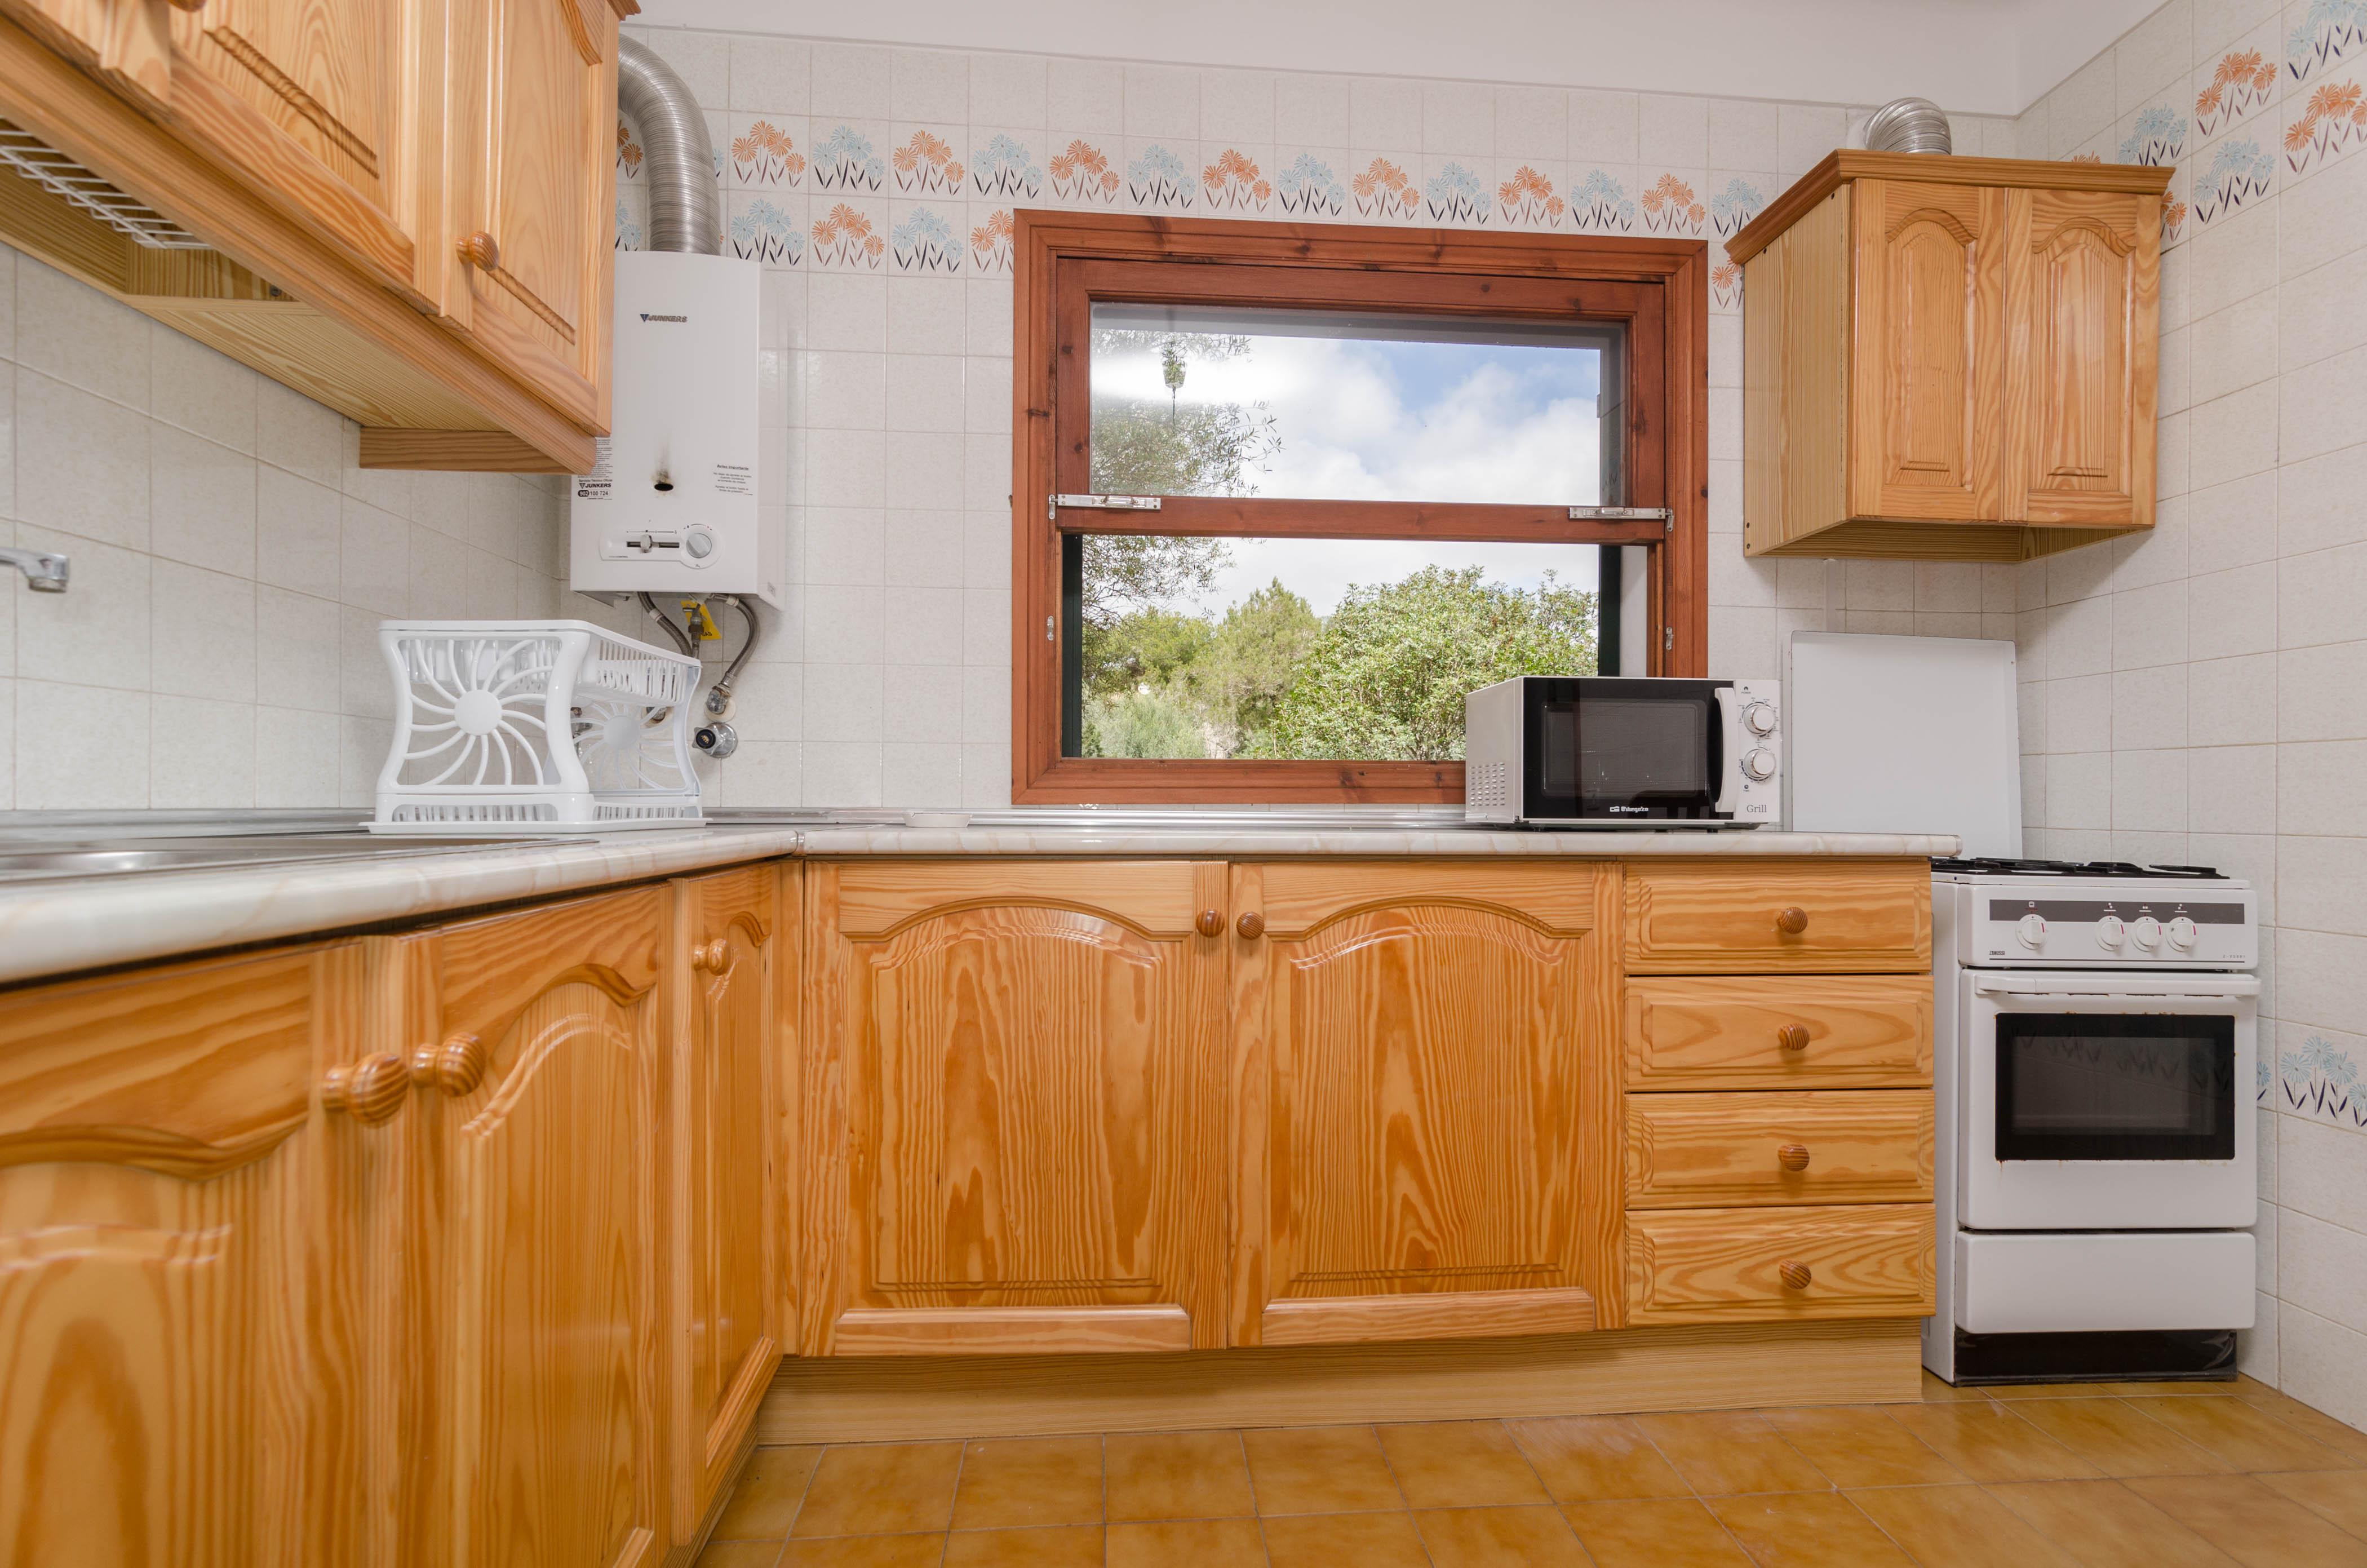 Ferienhaus Chalet- LLESCA (1935845), Santanyi, Mallorca, Balearische Inseln, Spanien, Bild 10